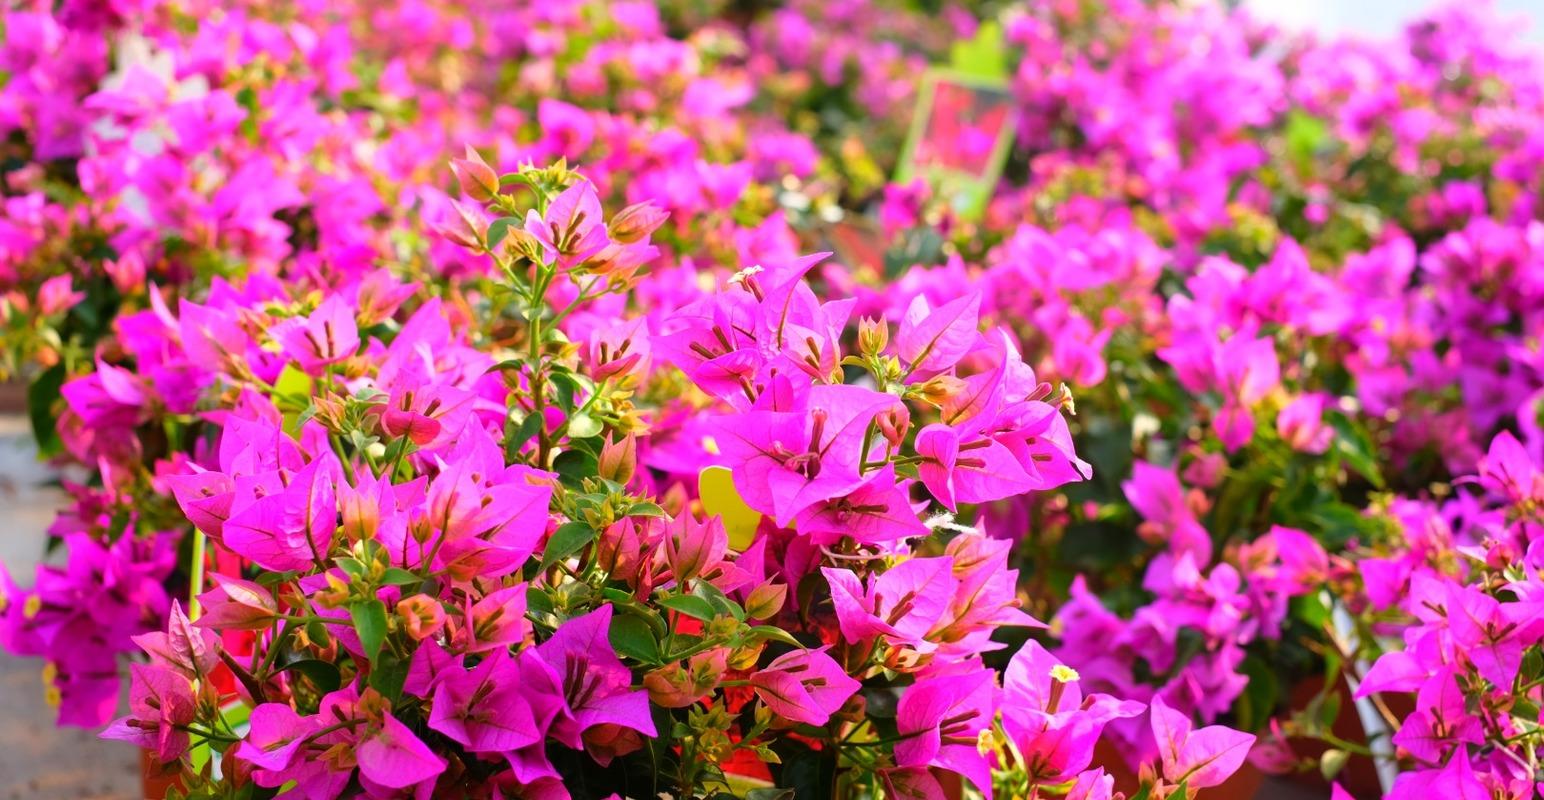 Grossiste fleurs Annecy, grossiste plantes Annecy,